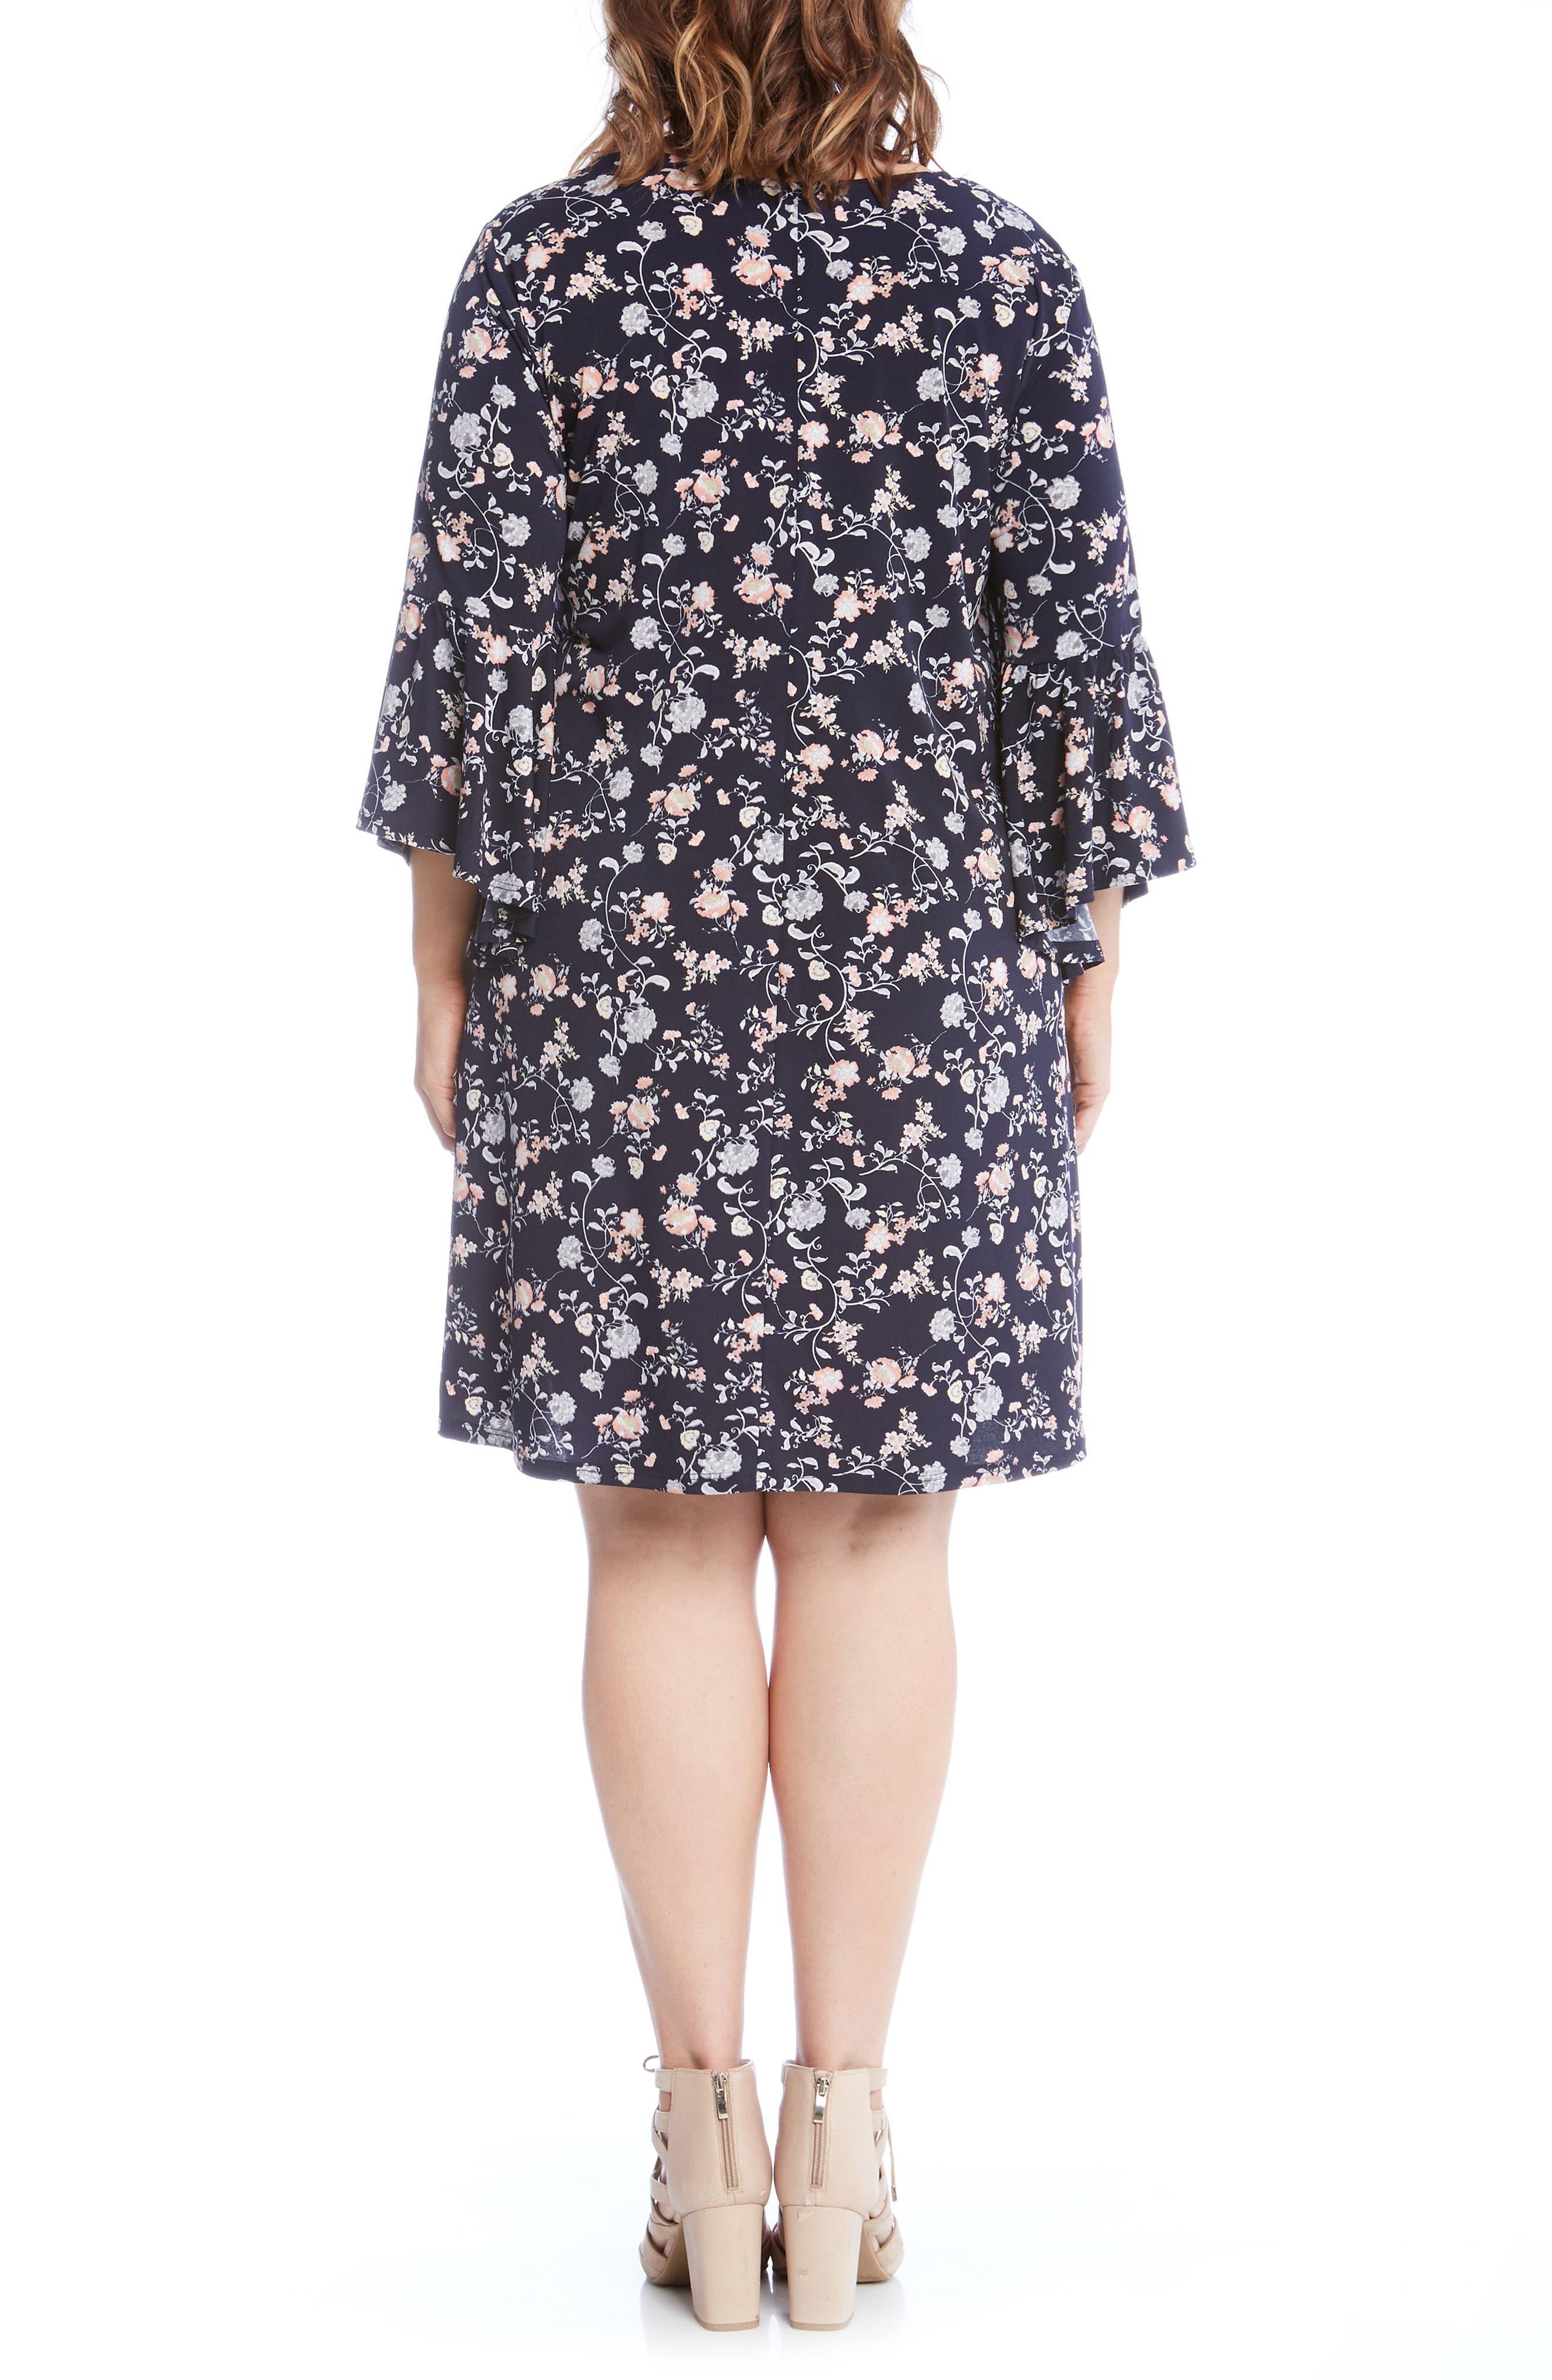 Ruffle Sleeve Floral Shift Dress,                             Main thumbnail 1, color,                             460